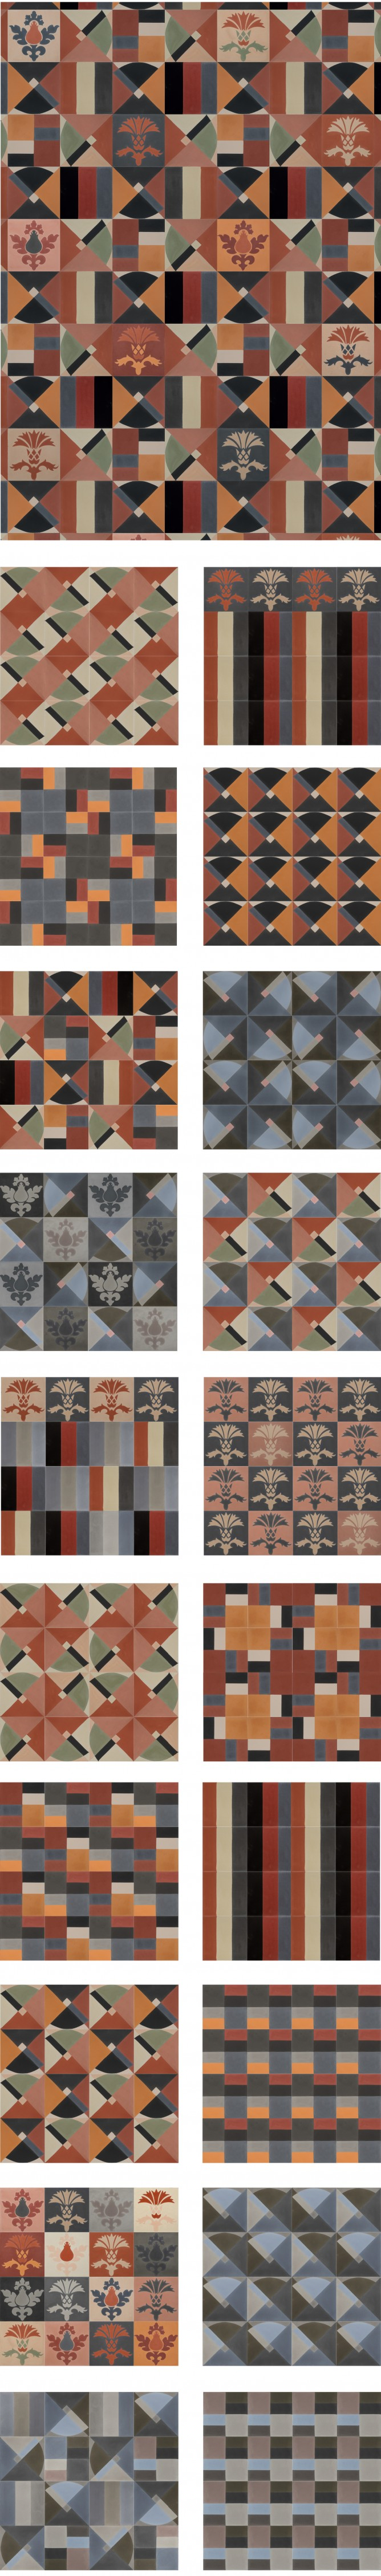 tegels Archives - Paulina Matusiak Grafisch ontwerp - Paulina ...